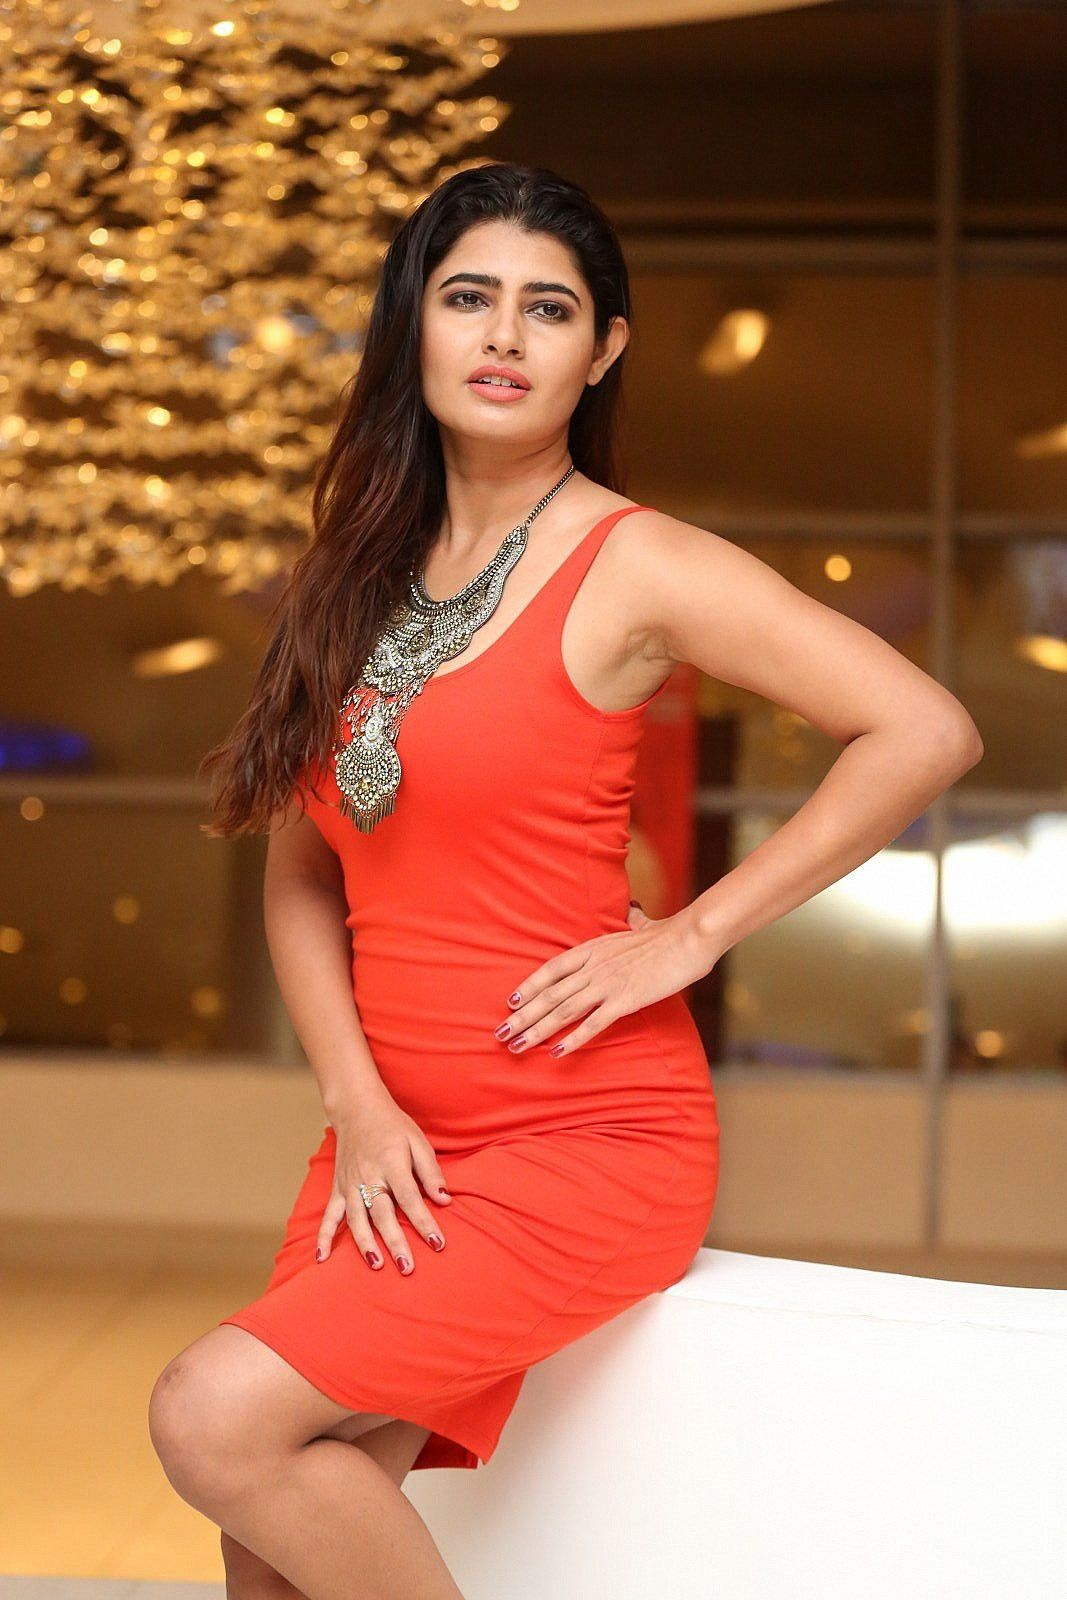 Pin by Sanjay Menavan on Beauty Actresses, South actress